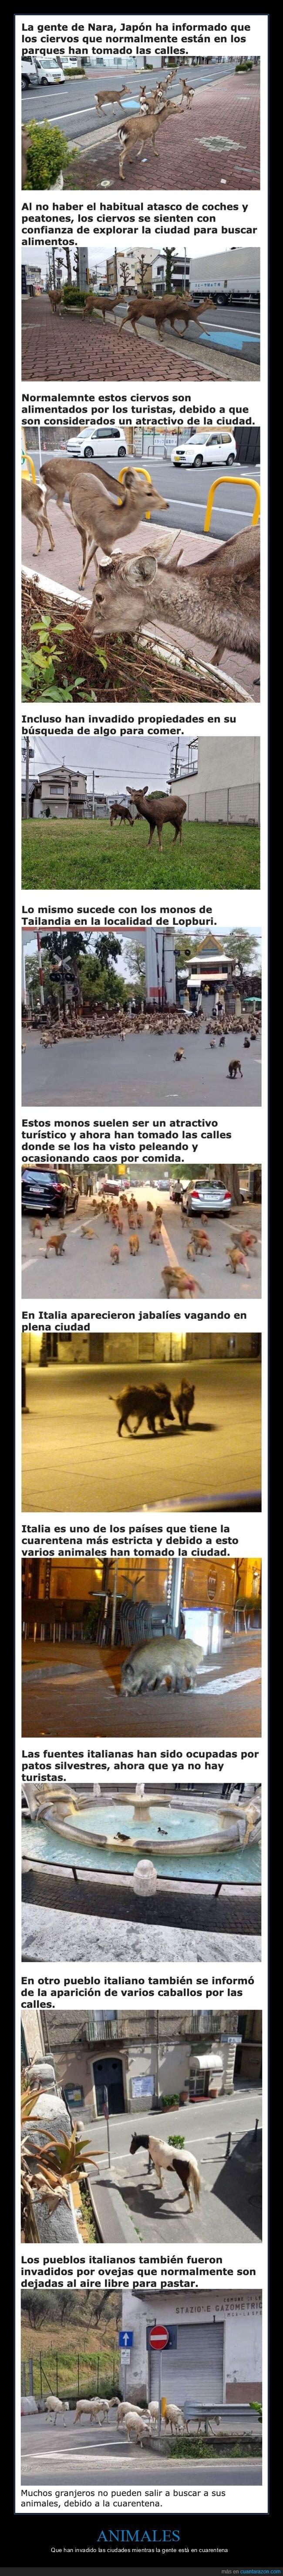 animales,ciudades,coronavirus,cuarentena,invadir